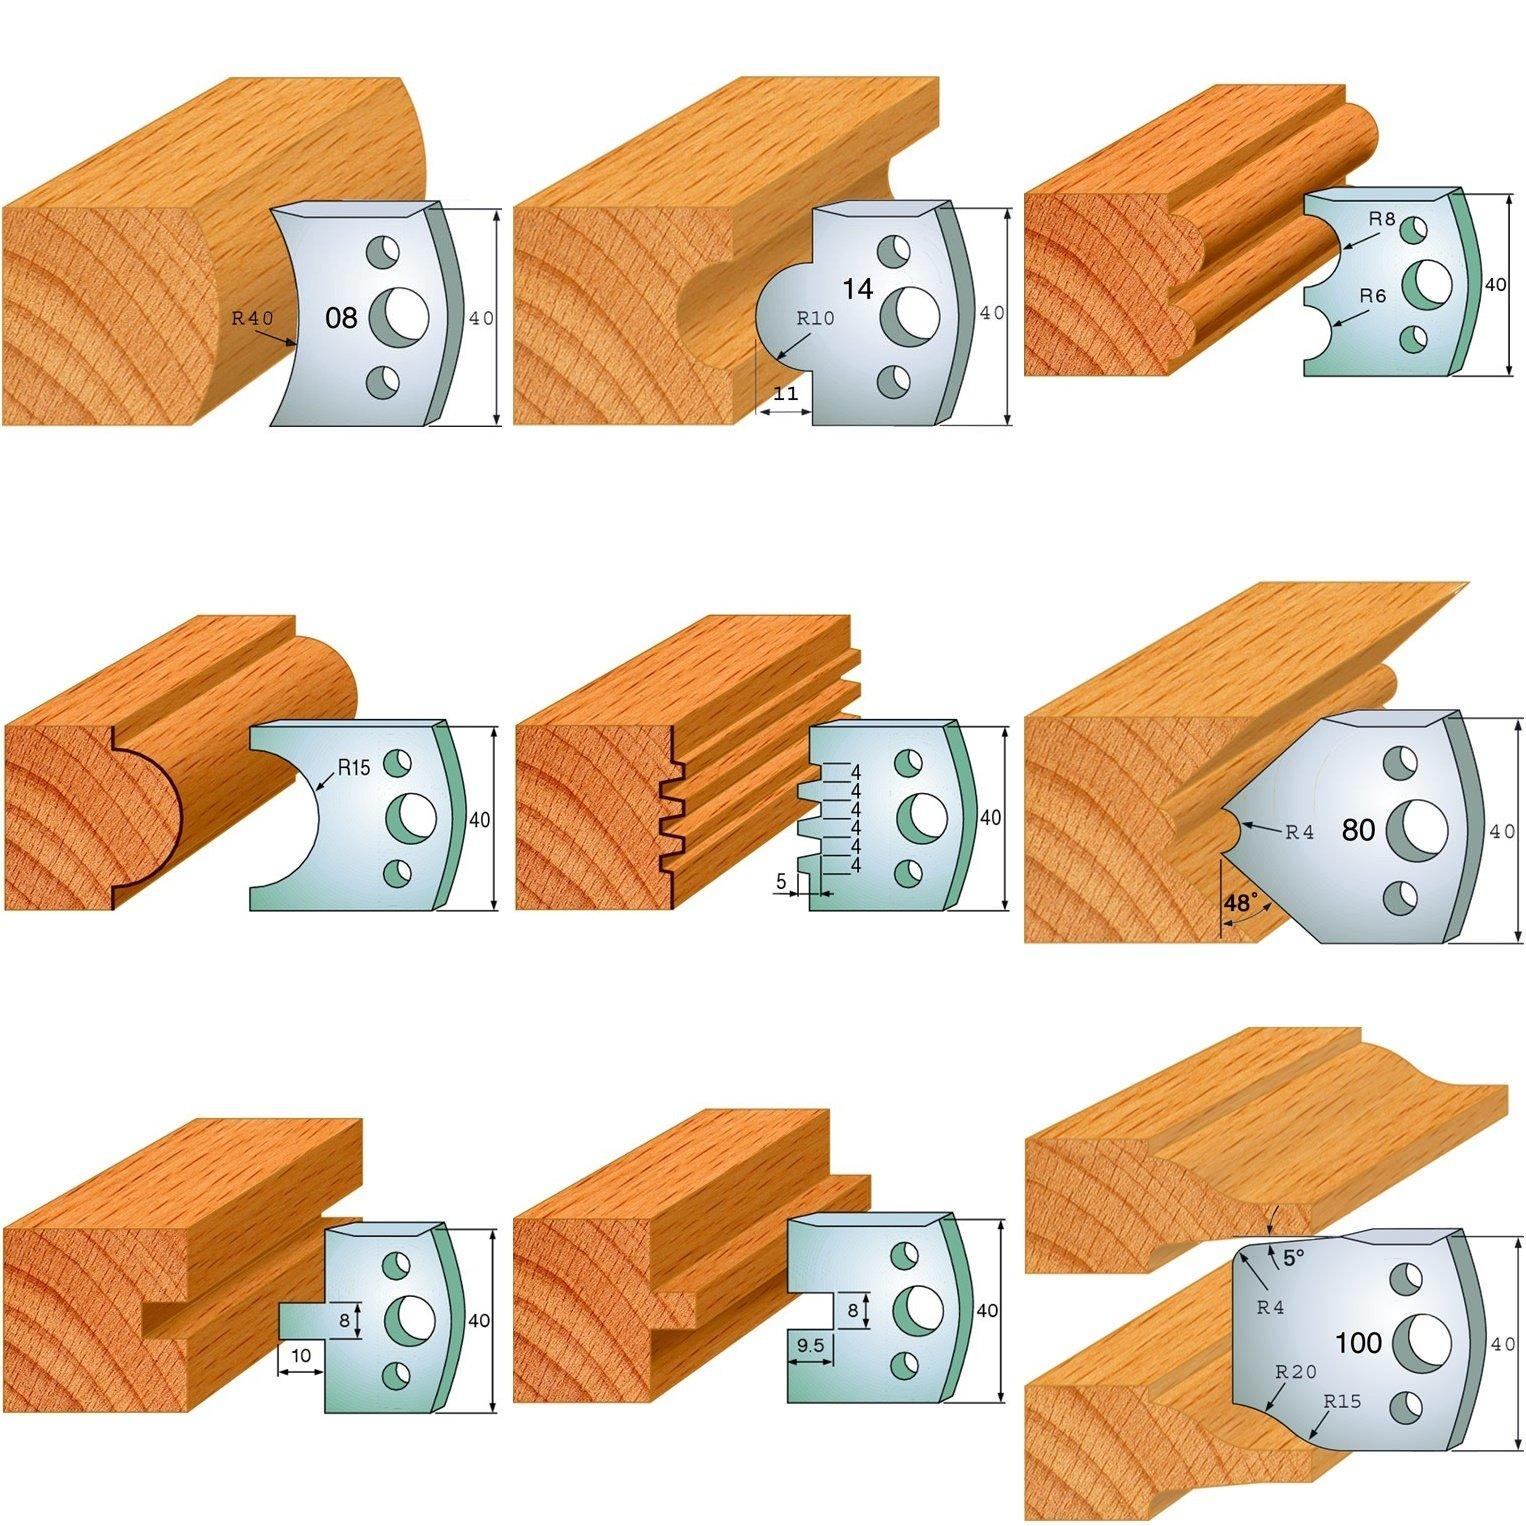 40mm Euro Profile Knives